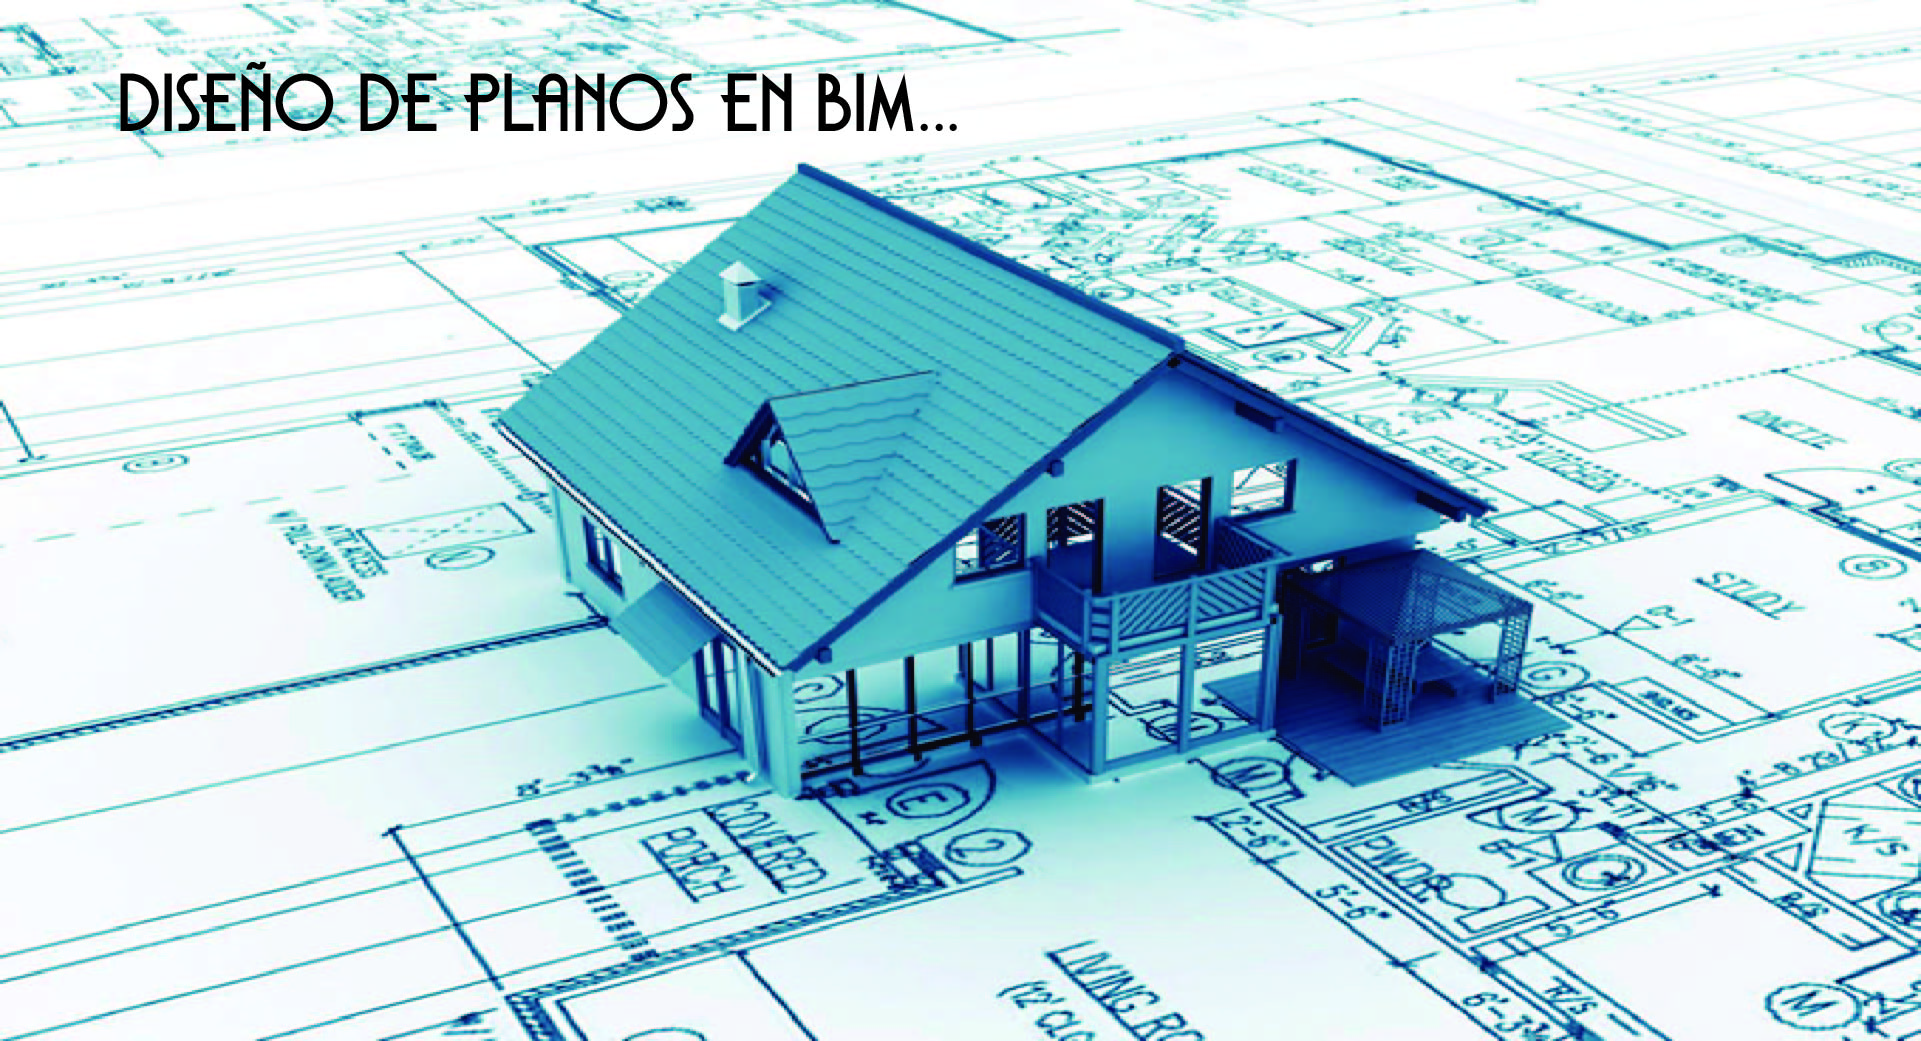 Diseño de planos en BIM